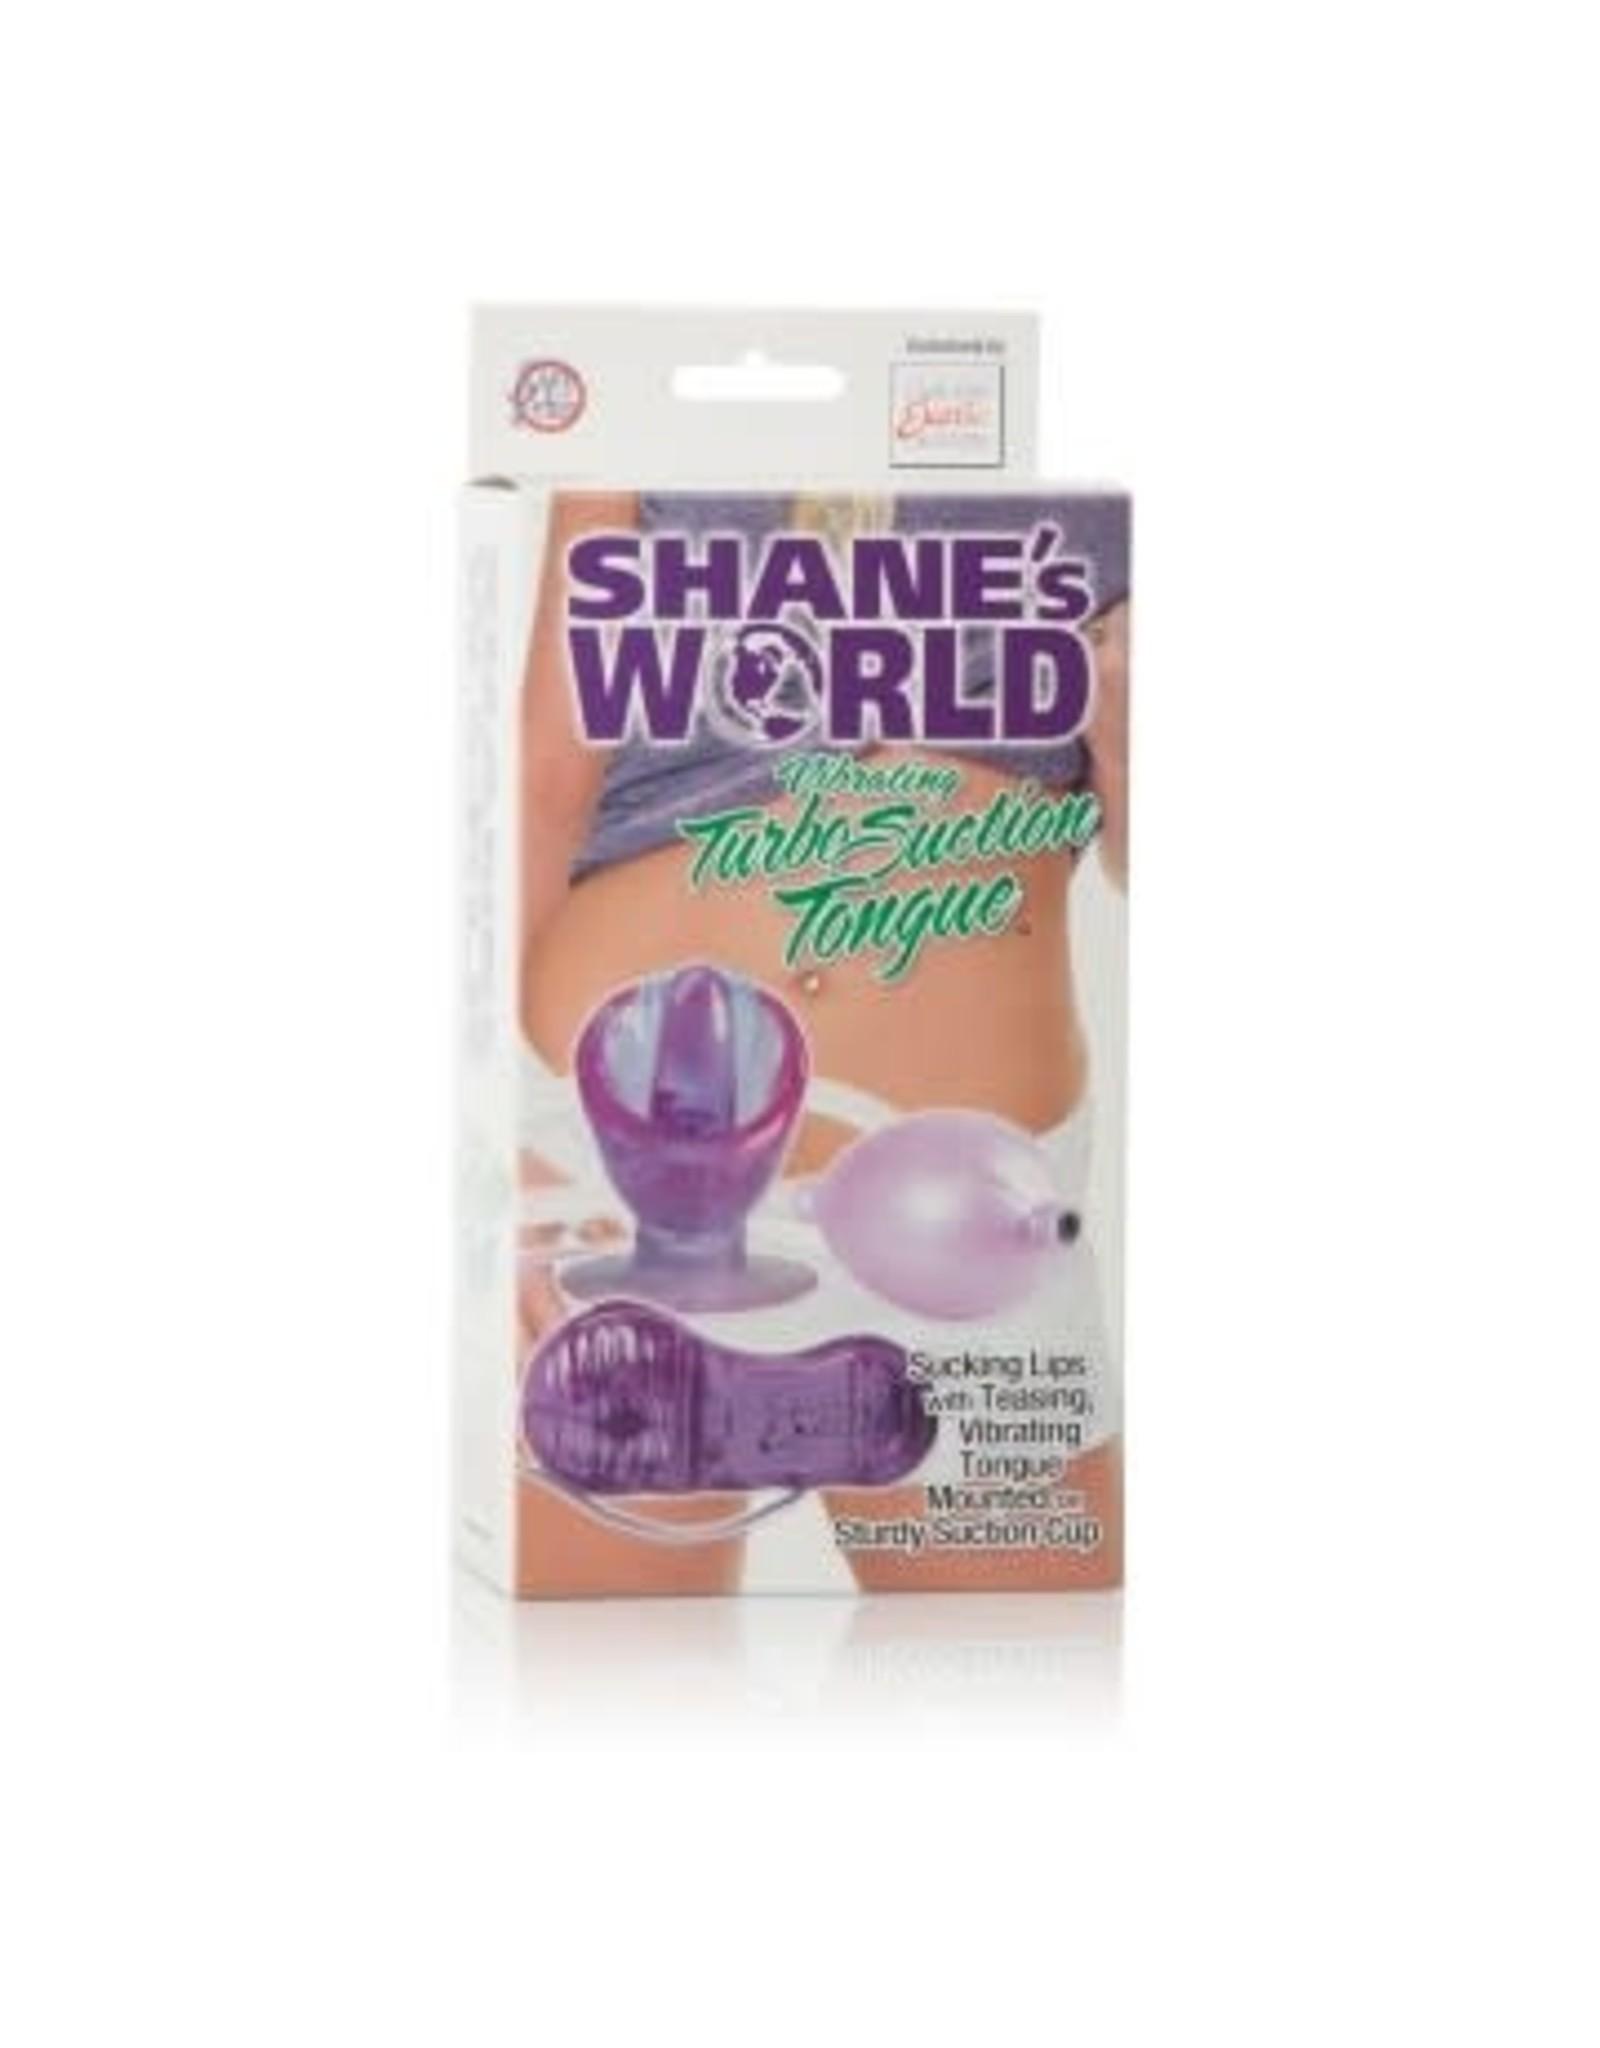 Shanes World Vibrating Turbo Suction Tongue